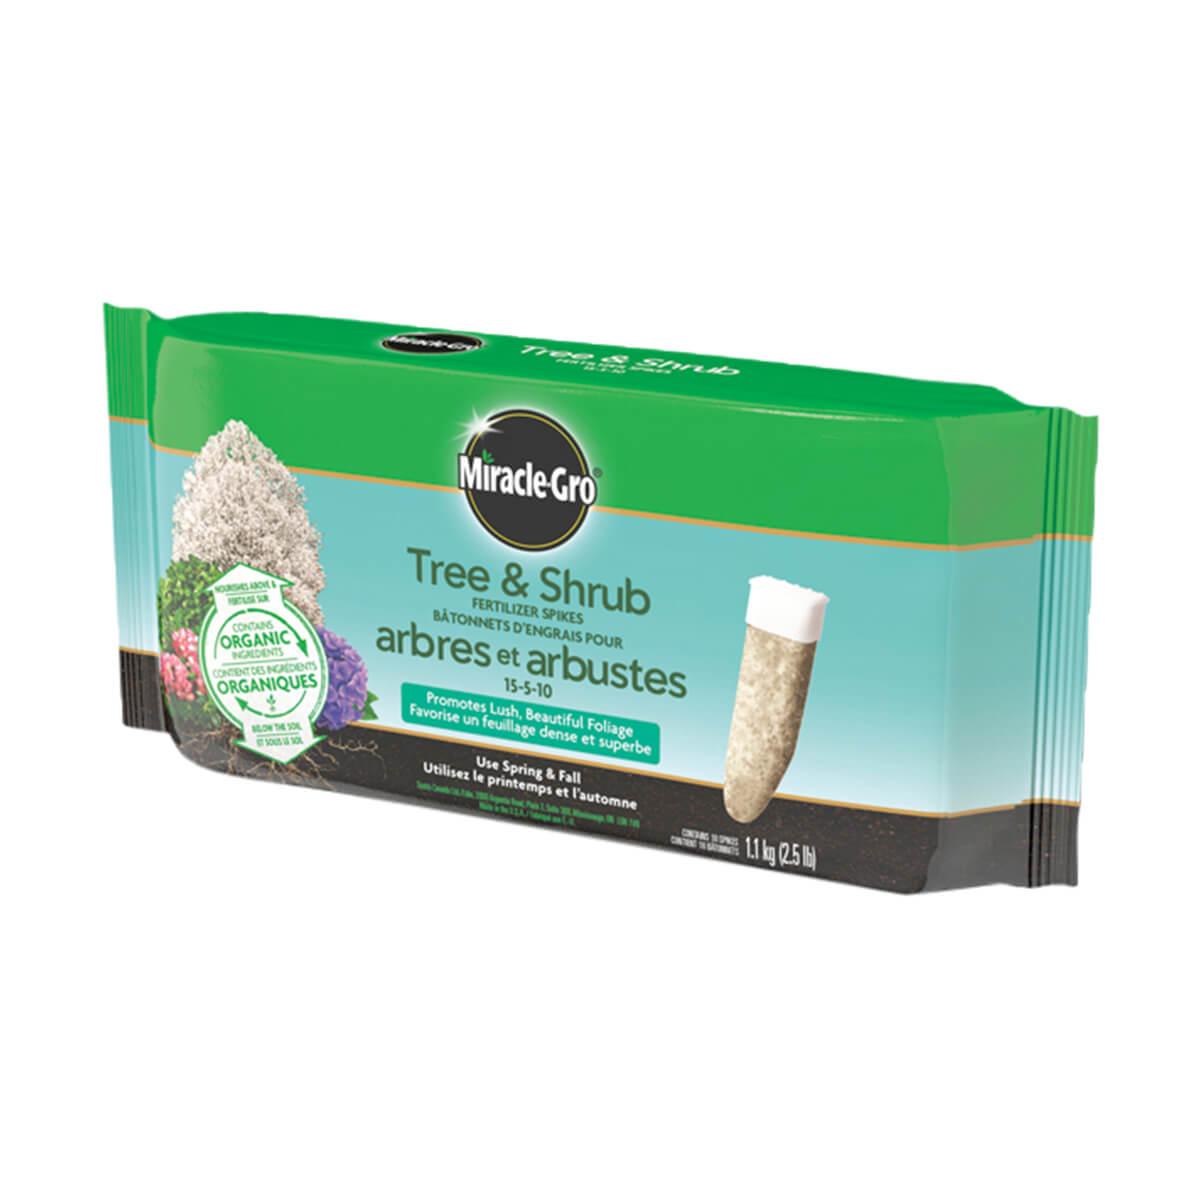 Miracle-Gro Tree & Shrub Fertilizer Spikes - 1.1 kg